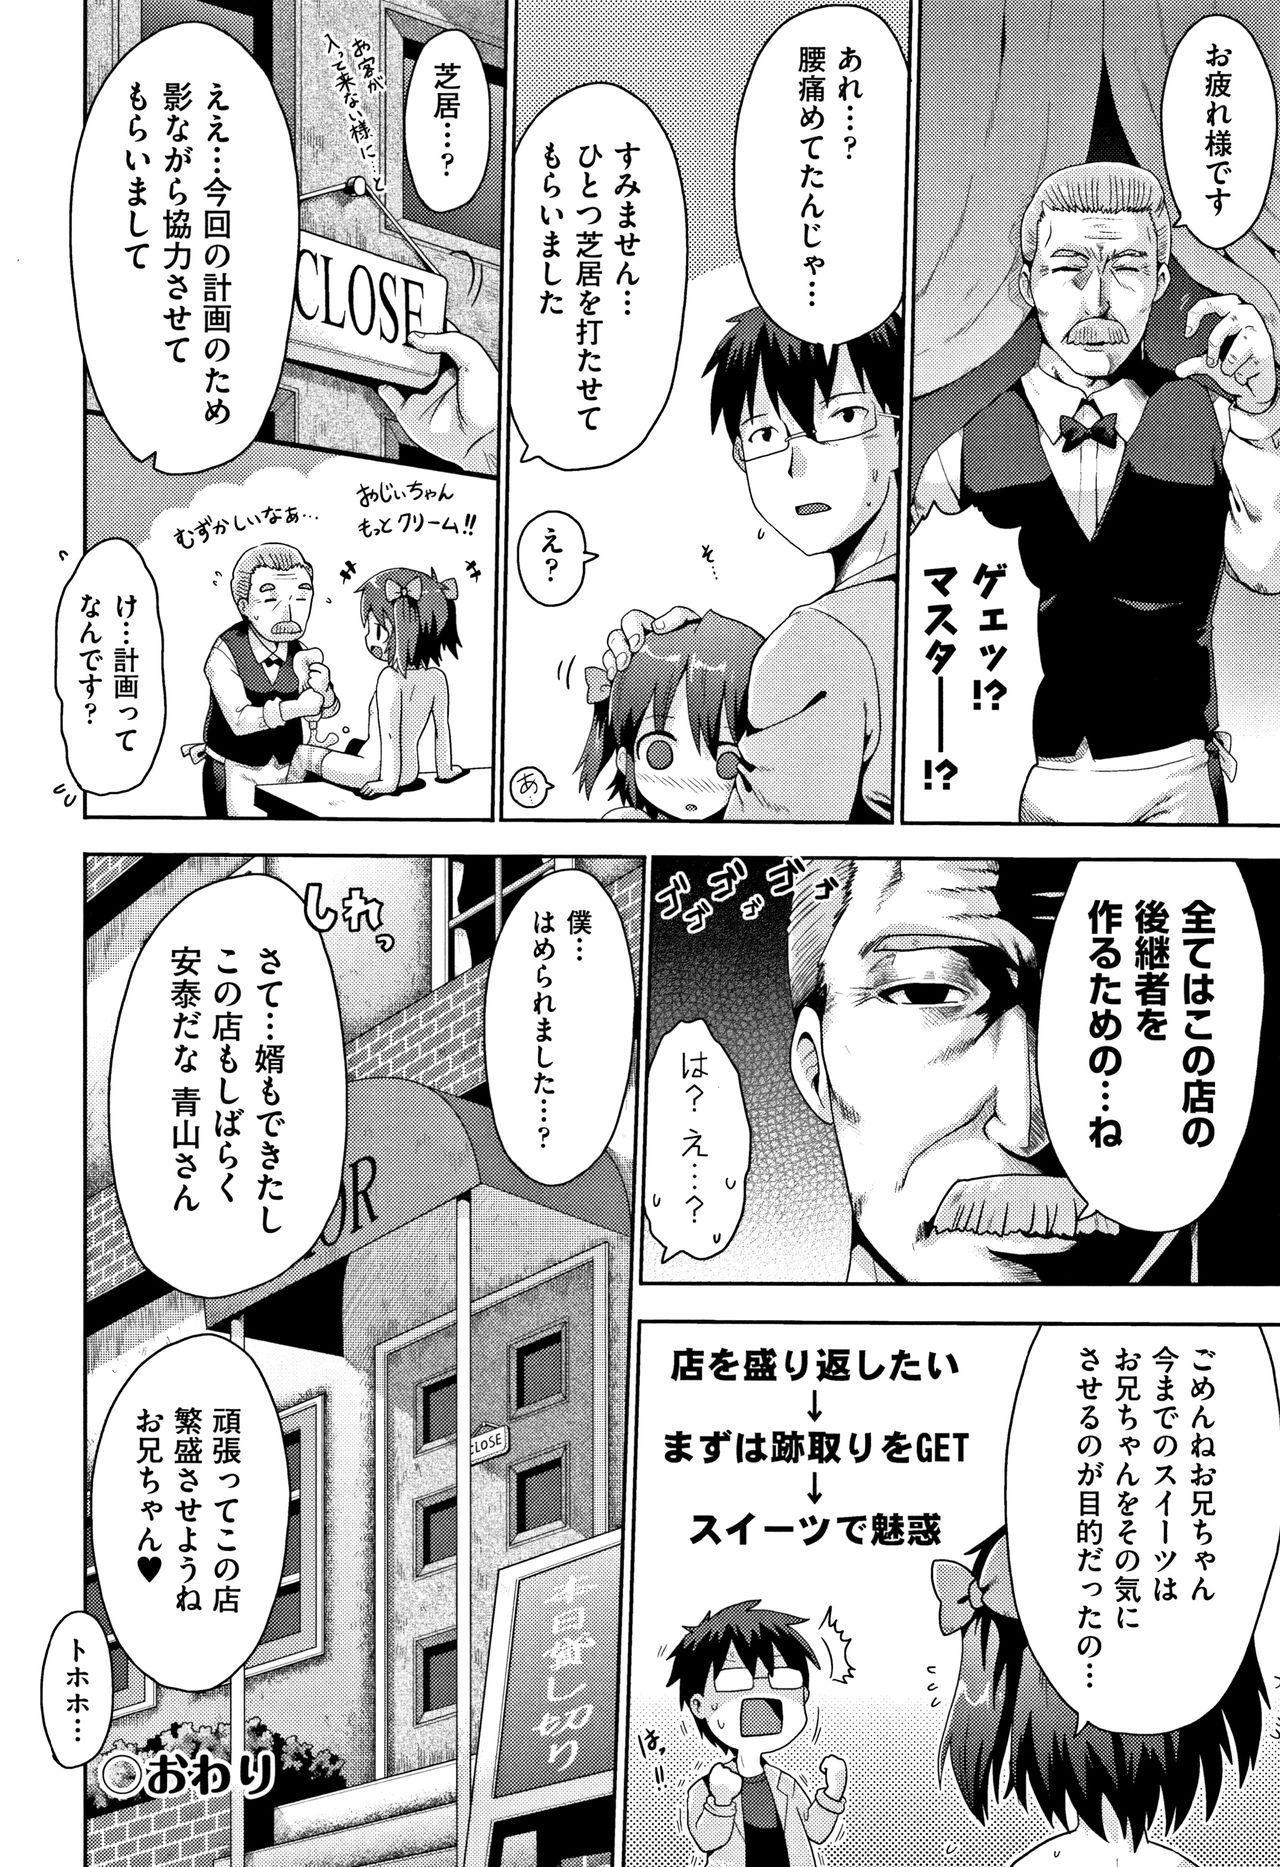 Kokugo Sansuu Rika Sex 194